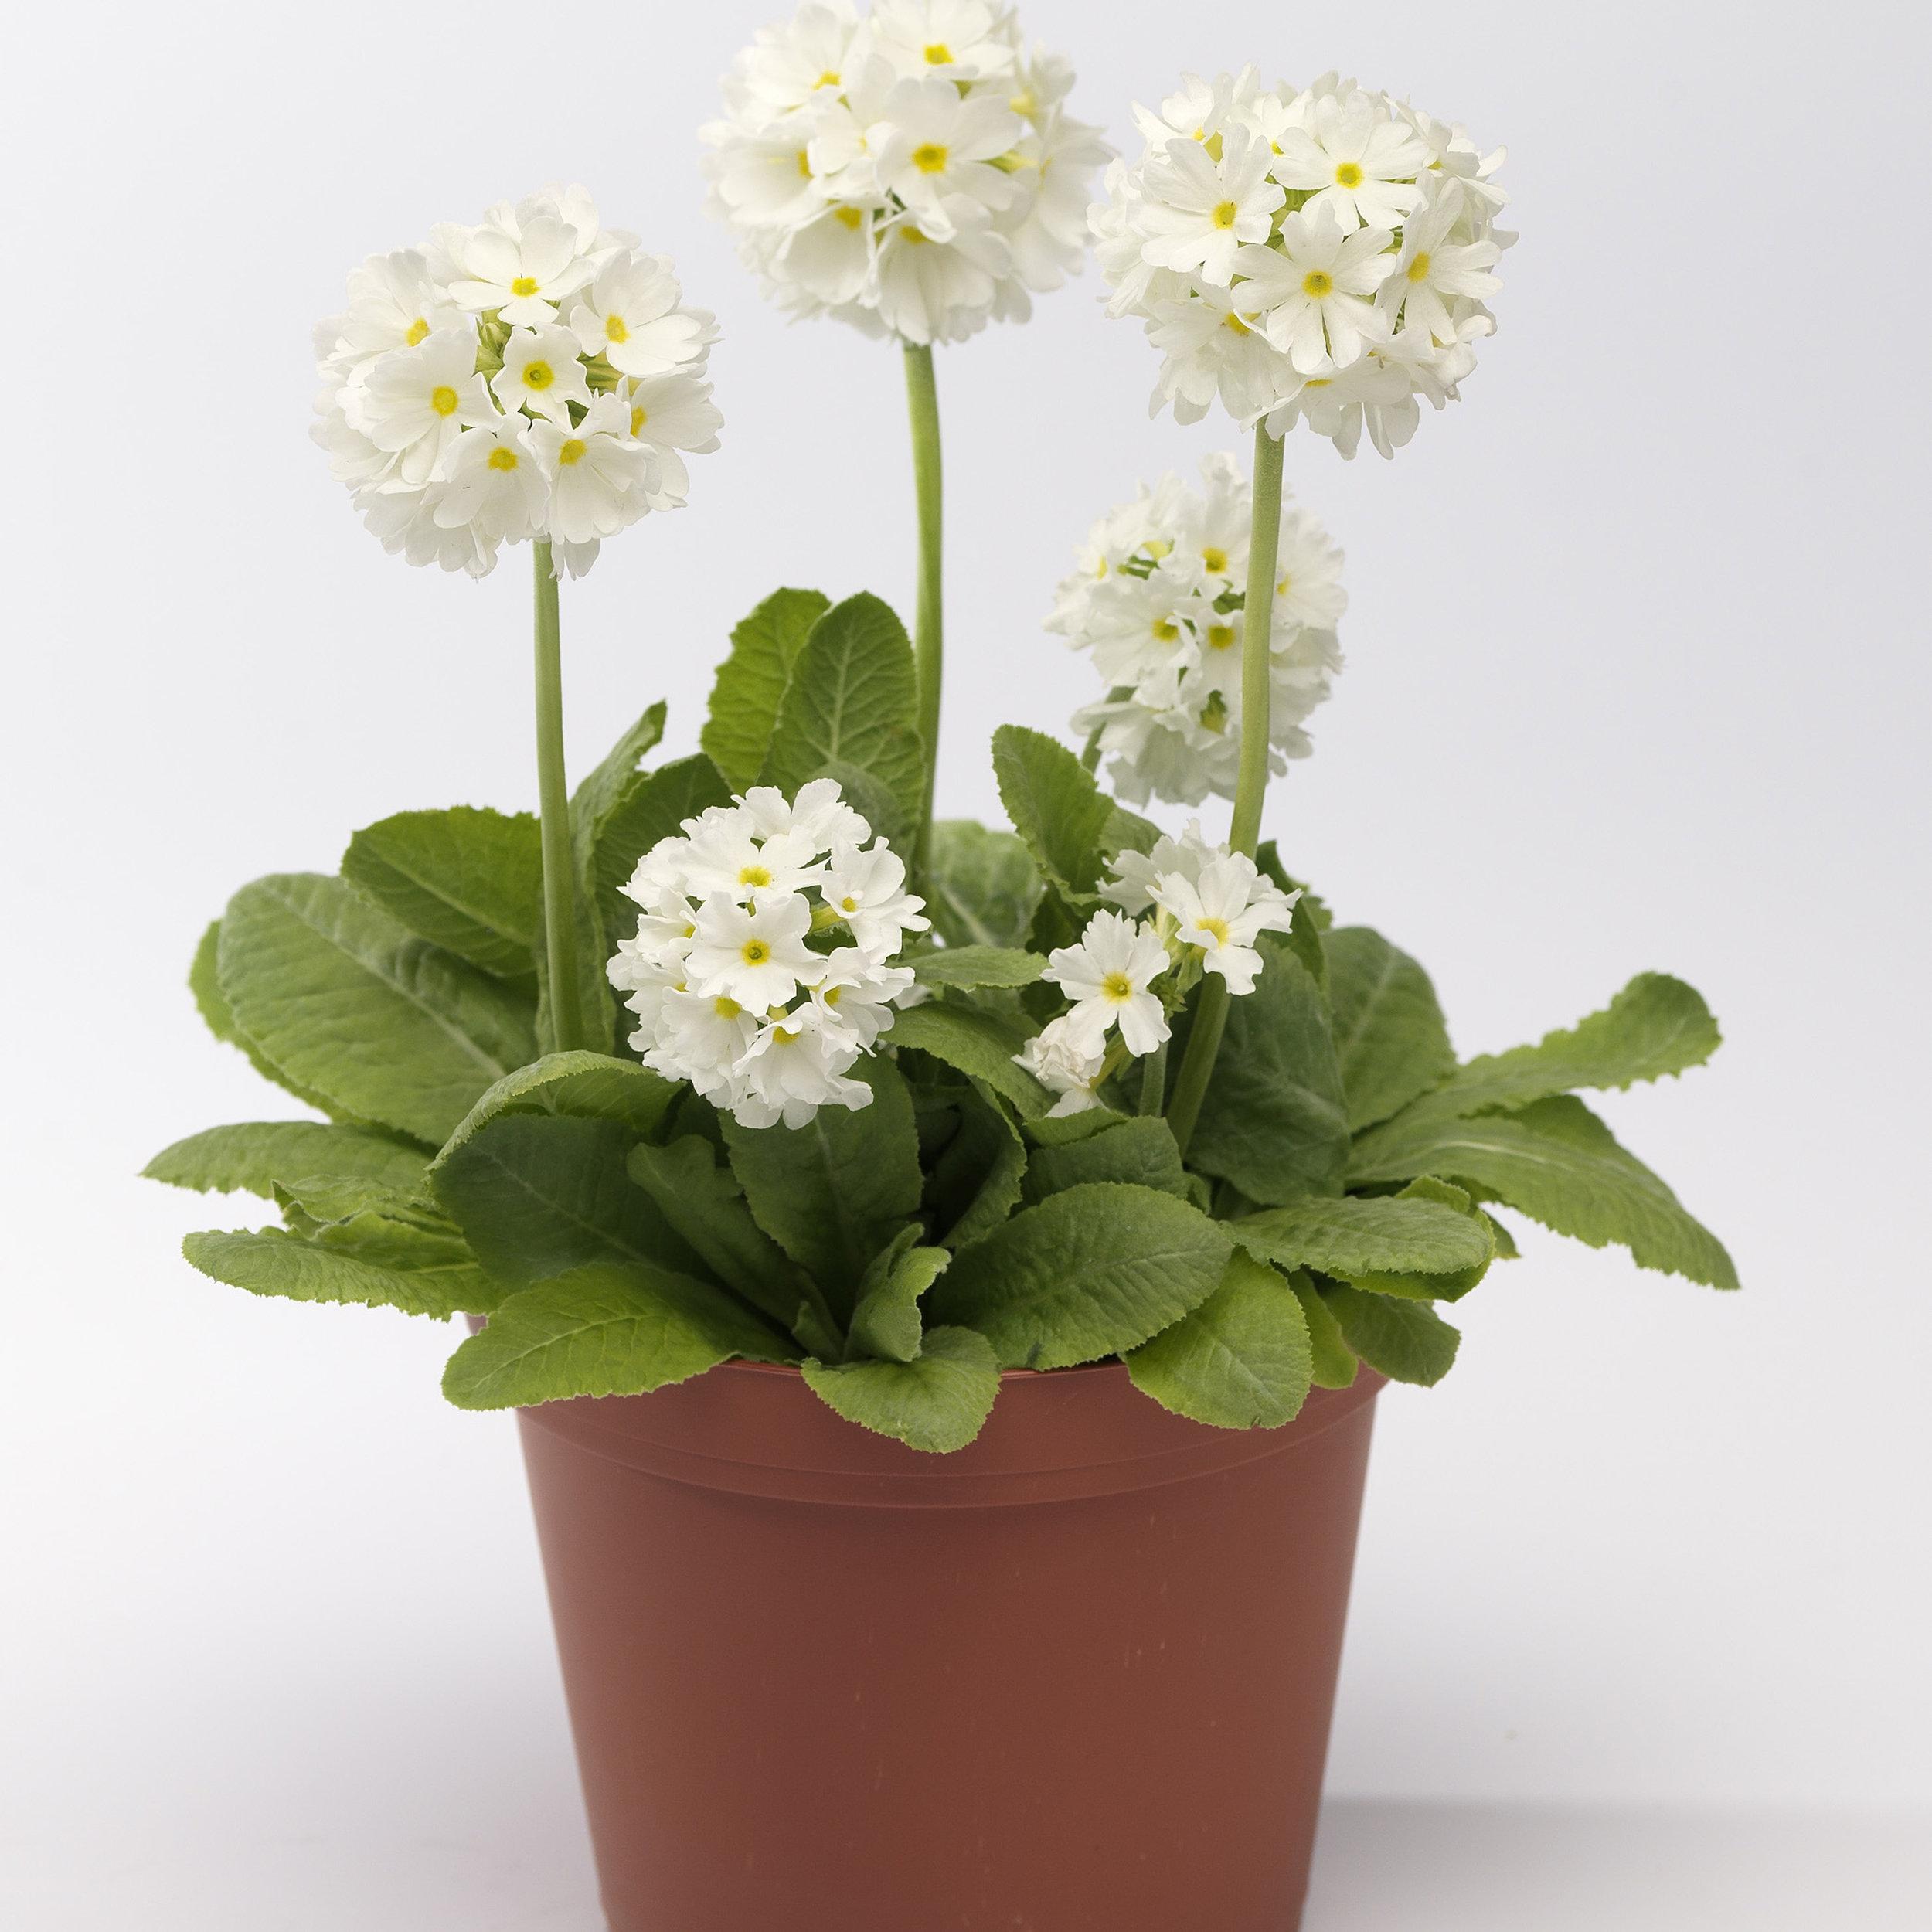 HR_Seed_Primula_Corolla__Corolla__White_70001239.jpg